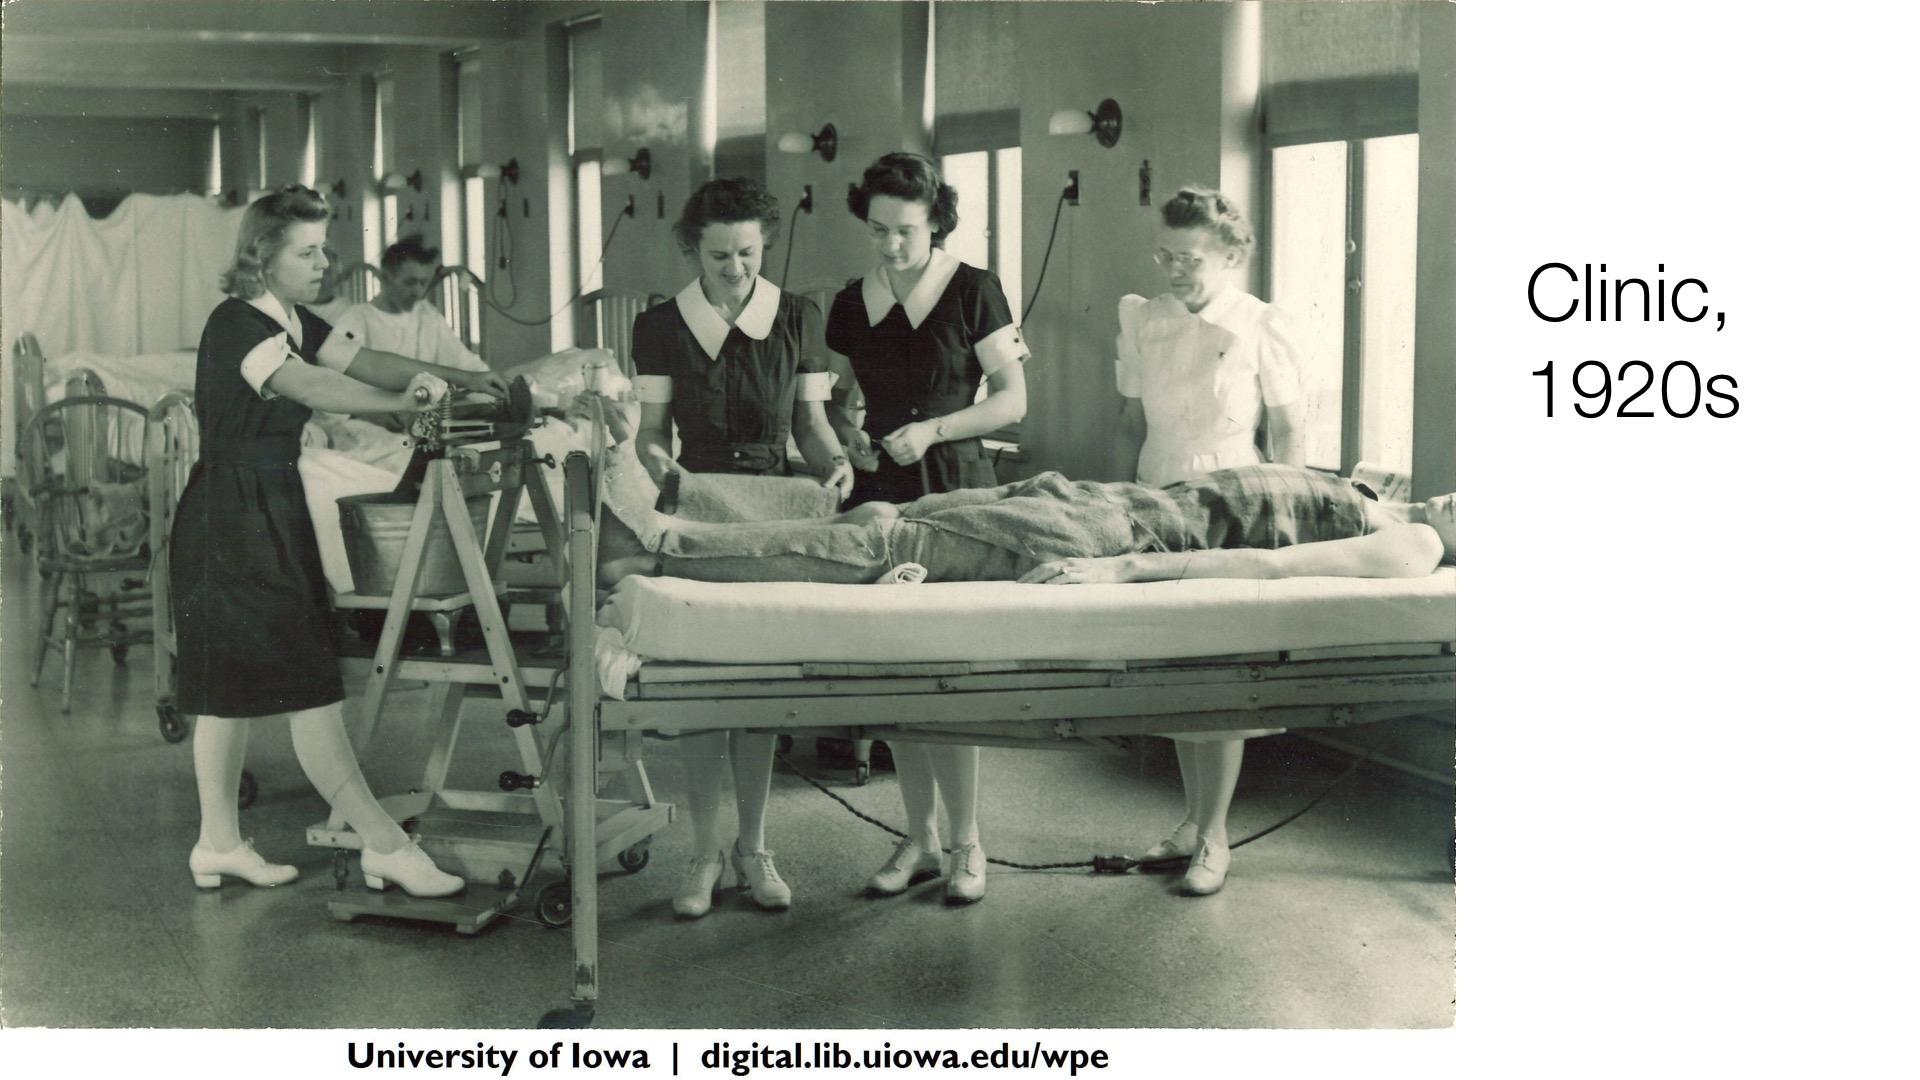 Clinic, 1920s